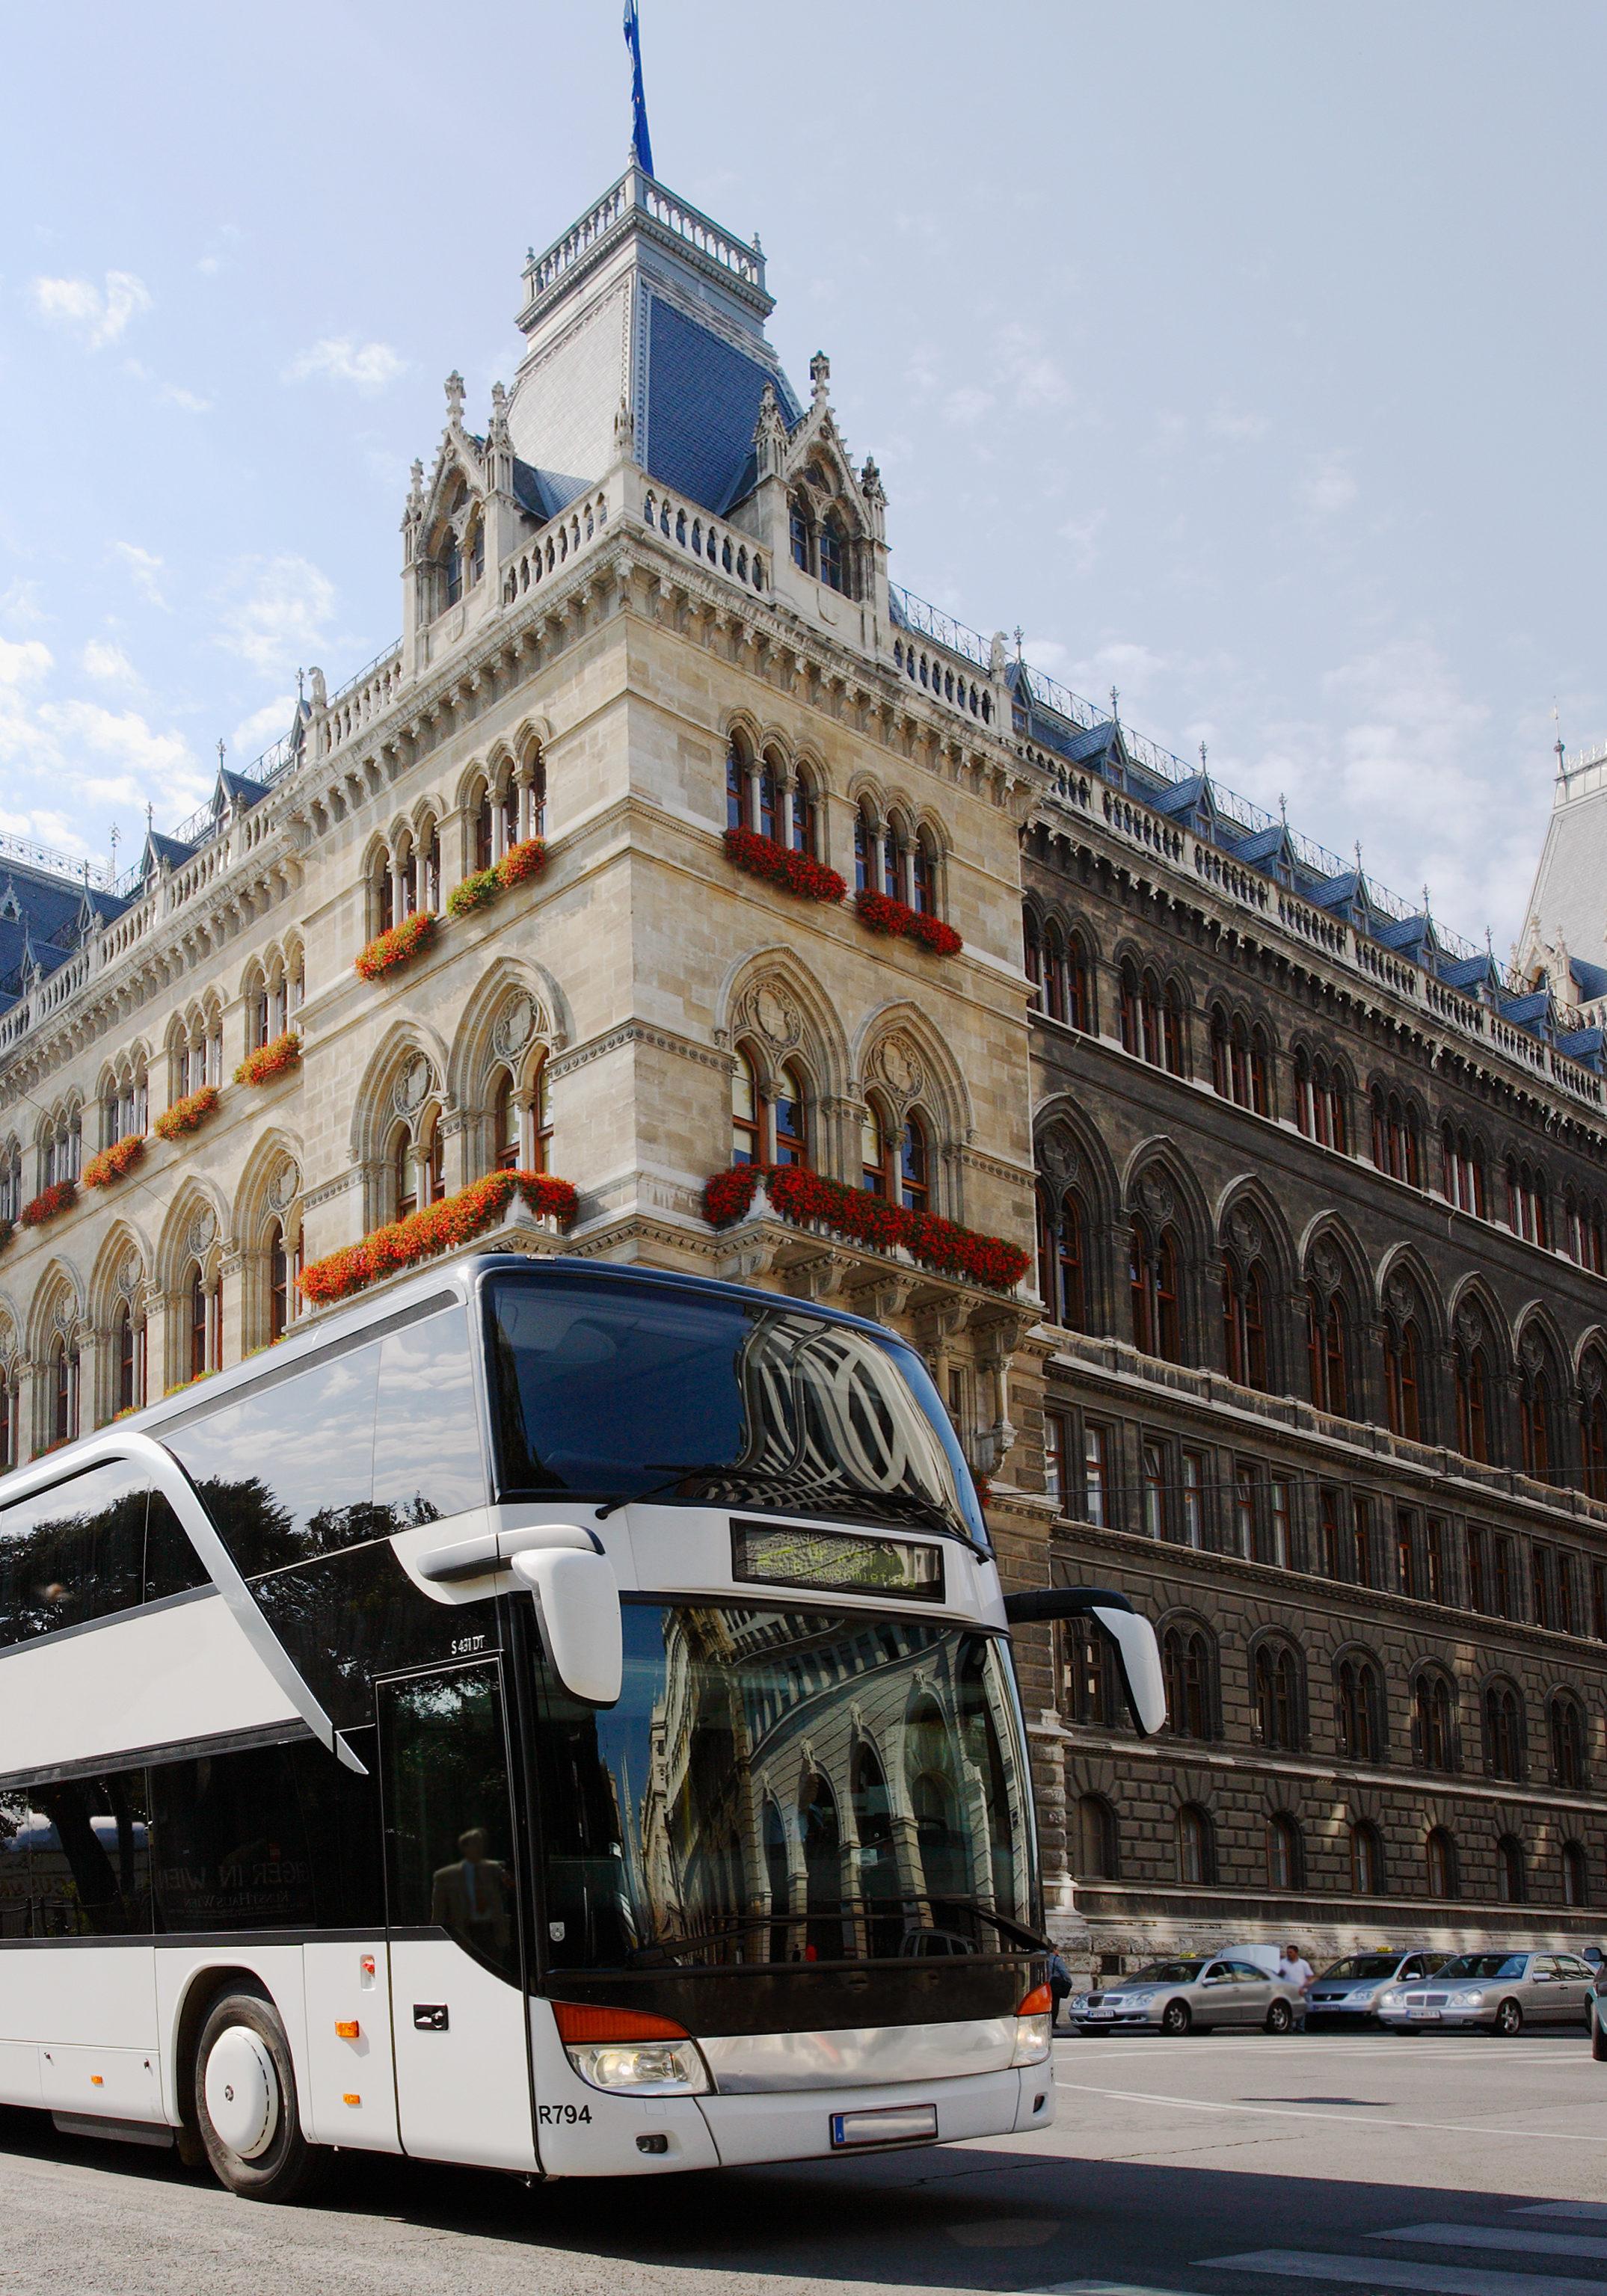 Bus vor Buckingham